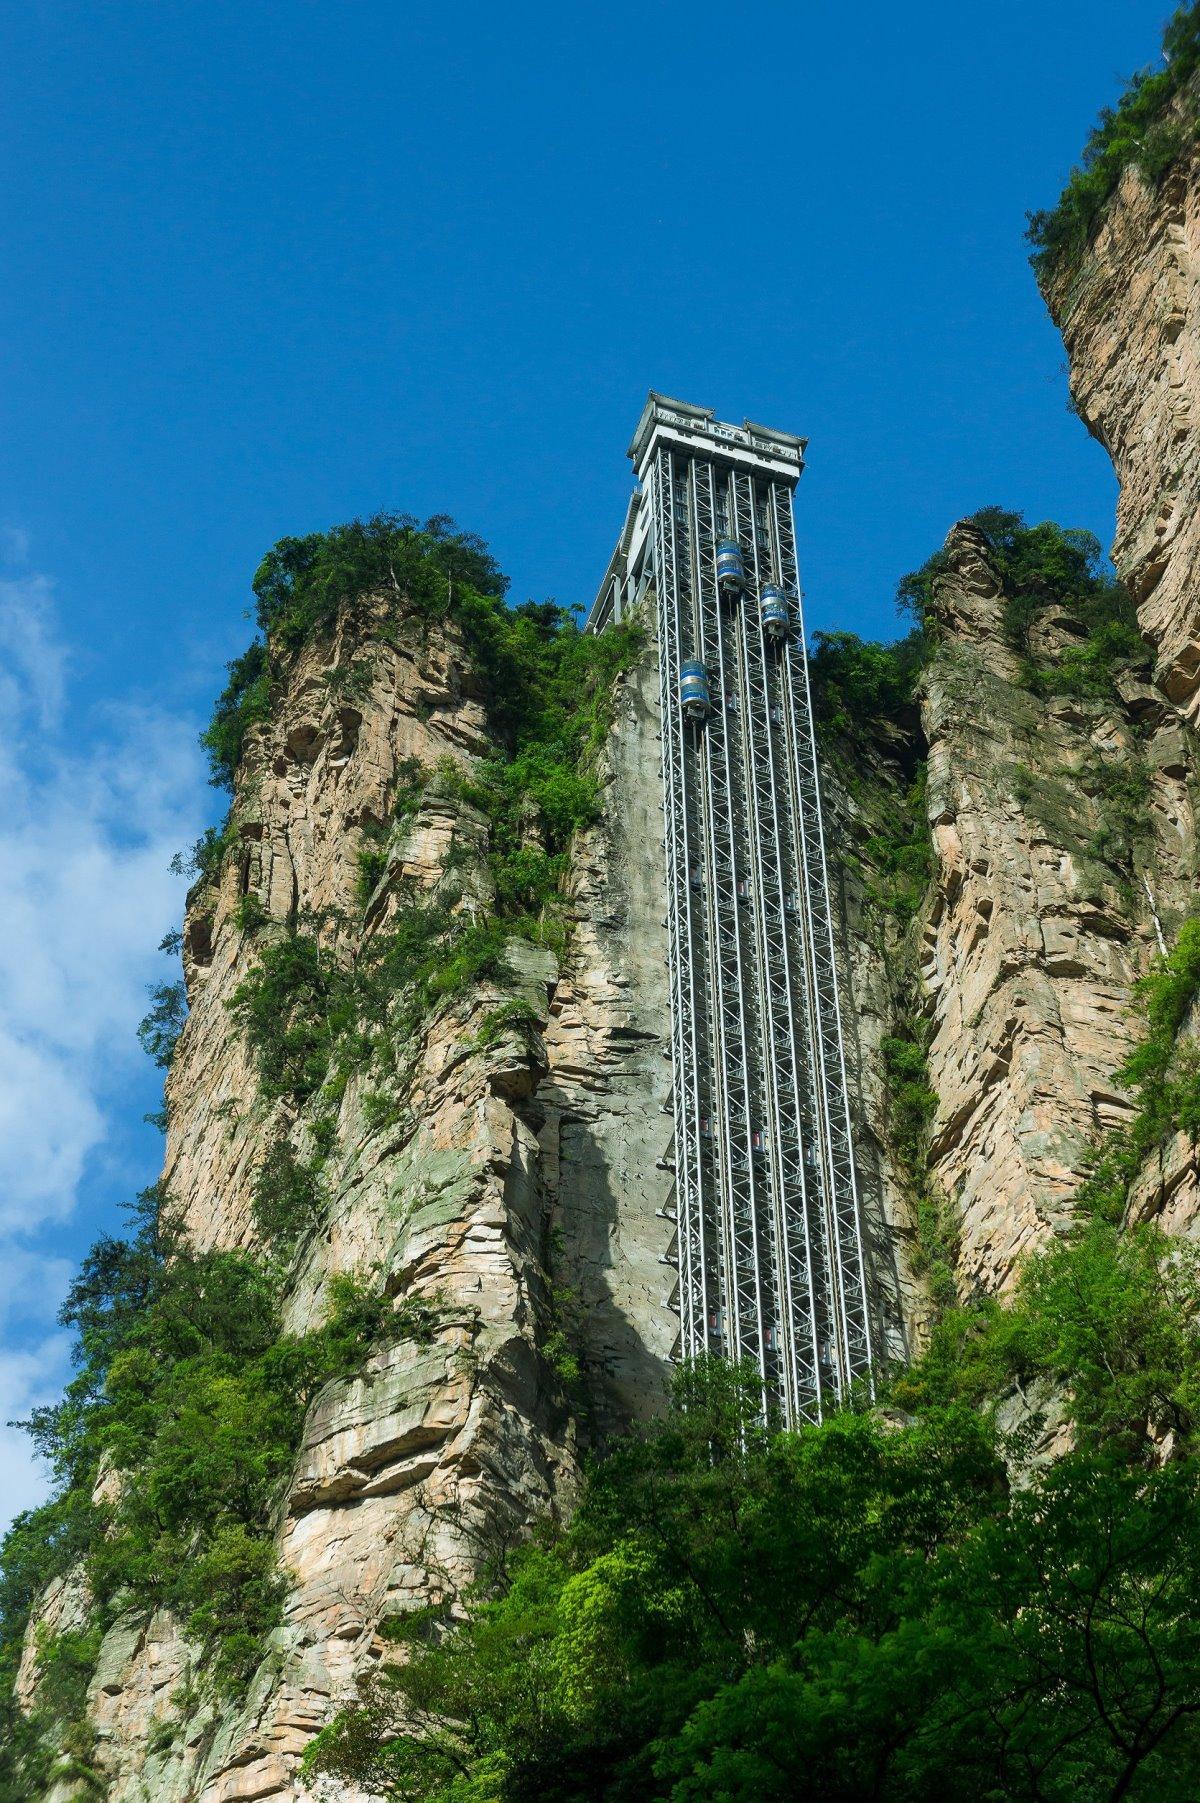 Bailong ασανσέρ στην Κίνα το ψηλότερο στον κόσμο